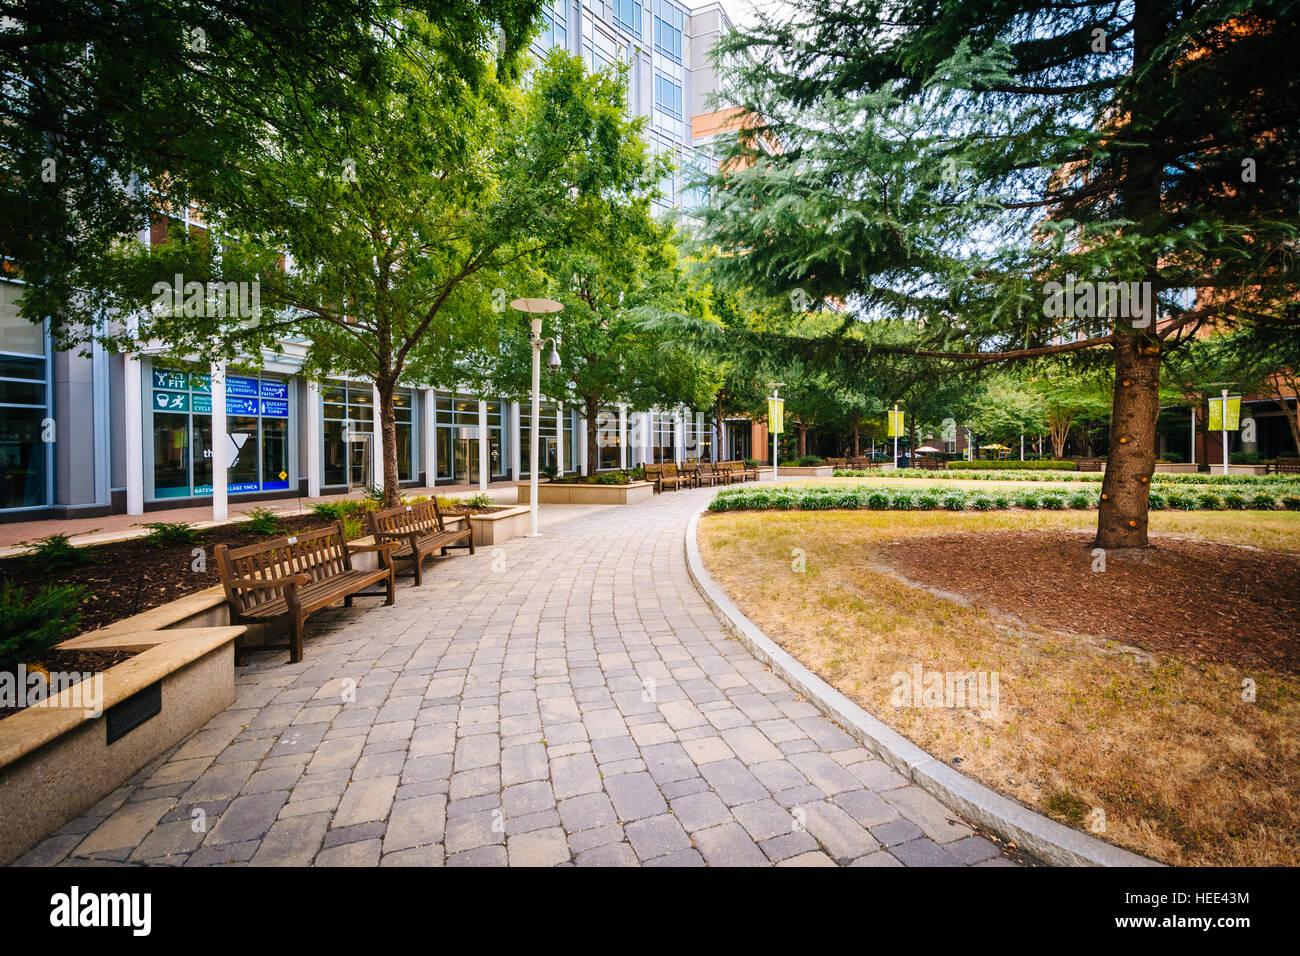 Walkway and buildings at Johnson & Wales University, in Charlotte, North Carolina. Stock Photo